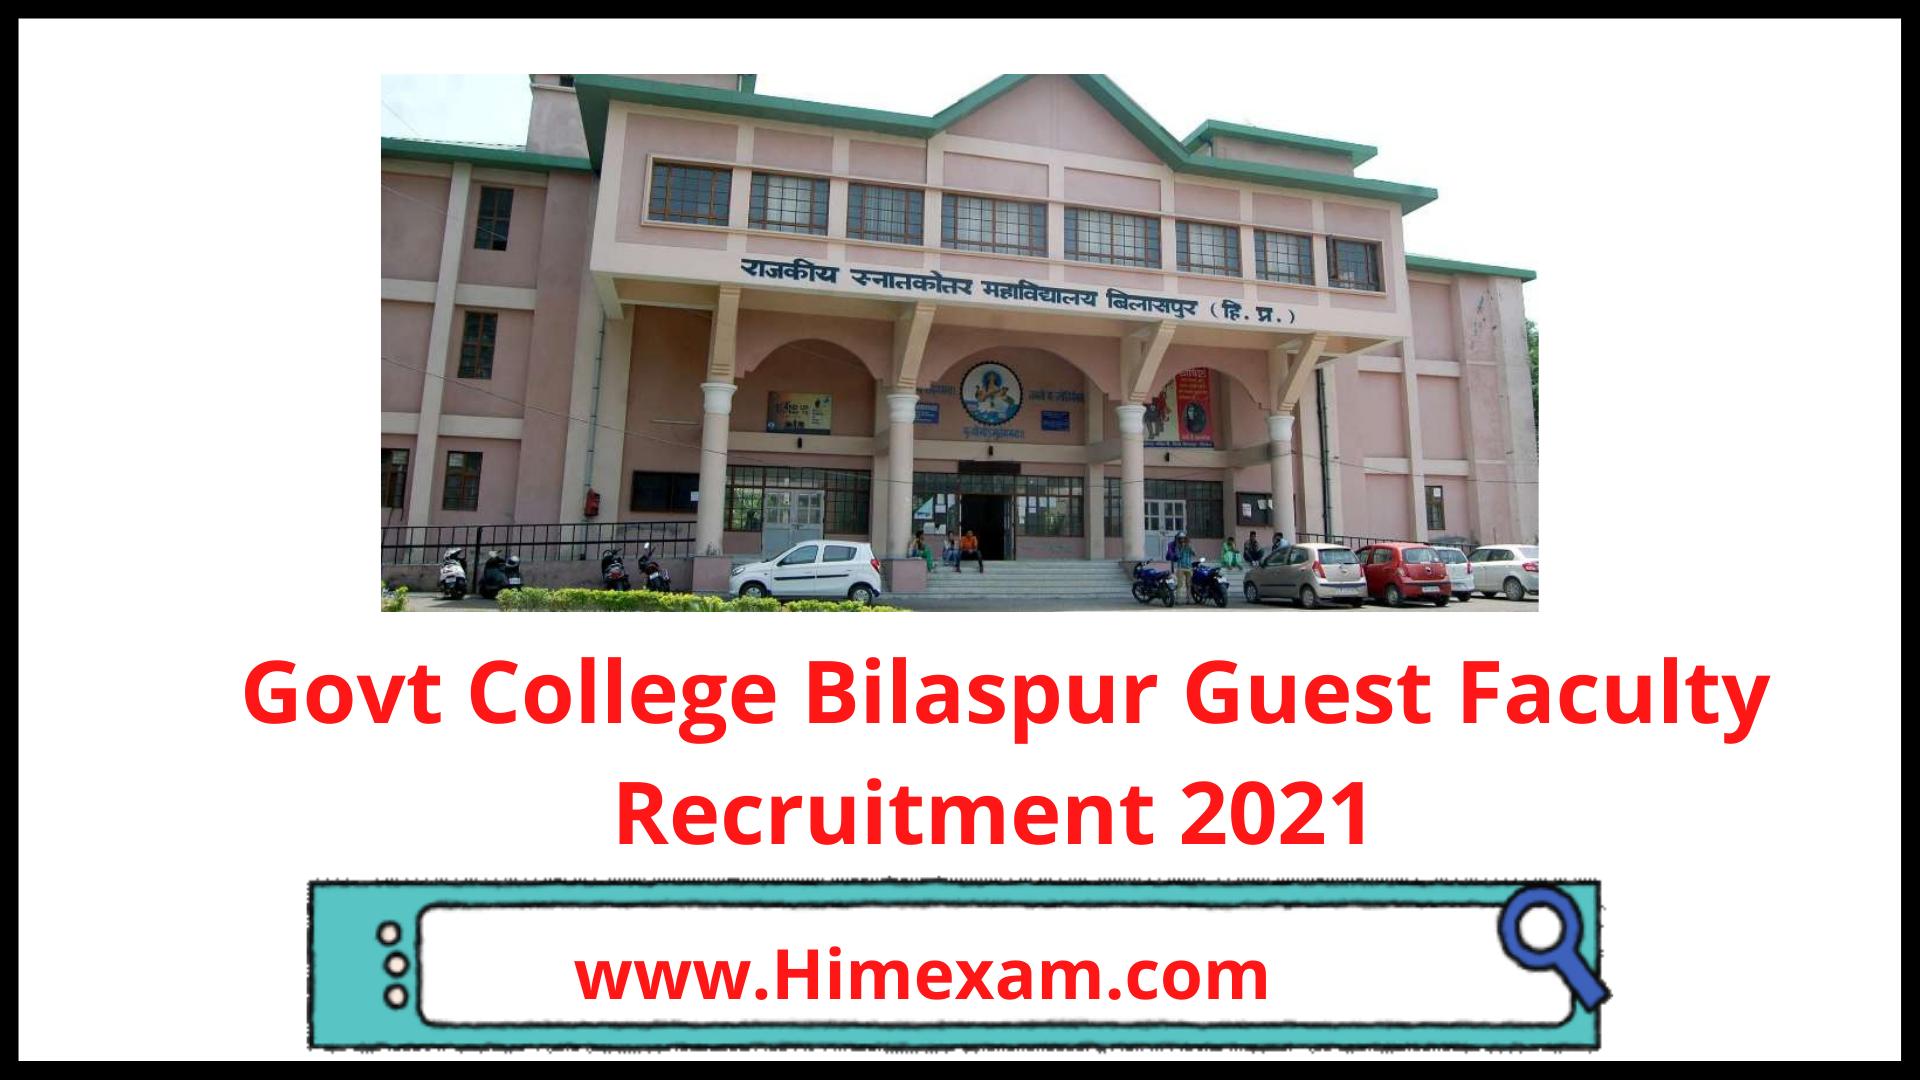 Govt College Bilaspur Guest Faculty  Recruitment 2021